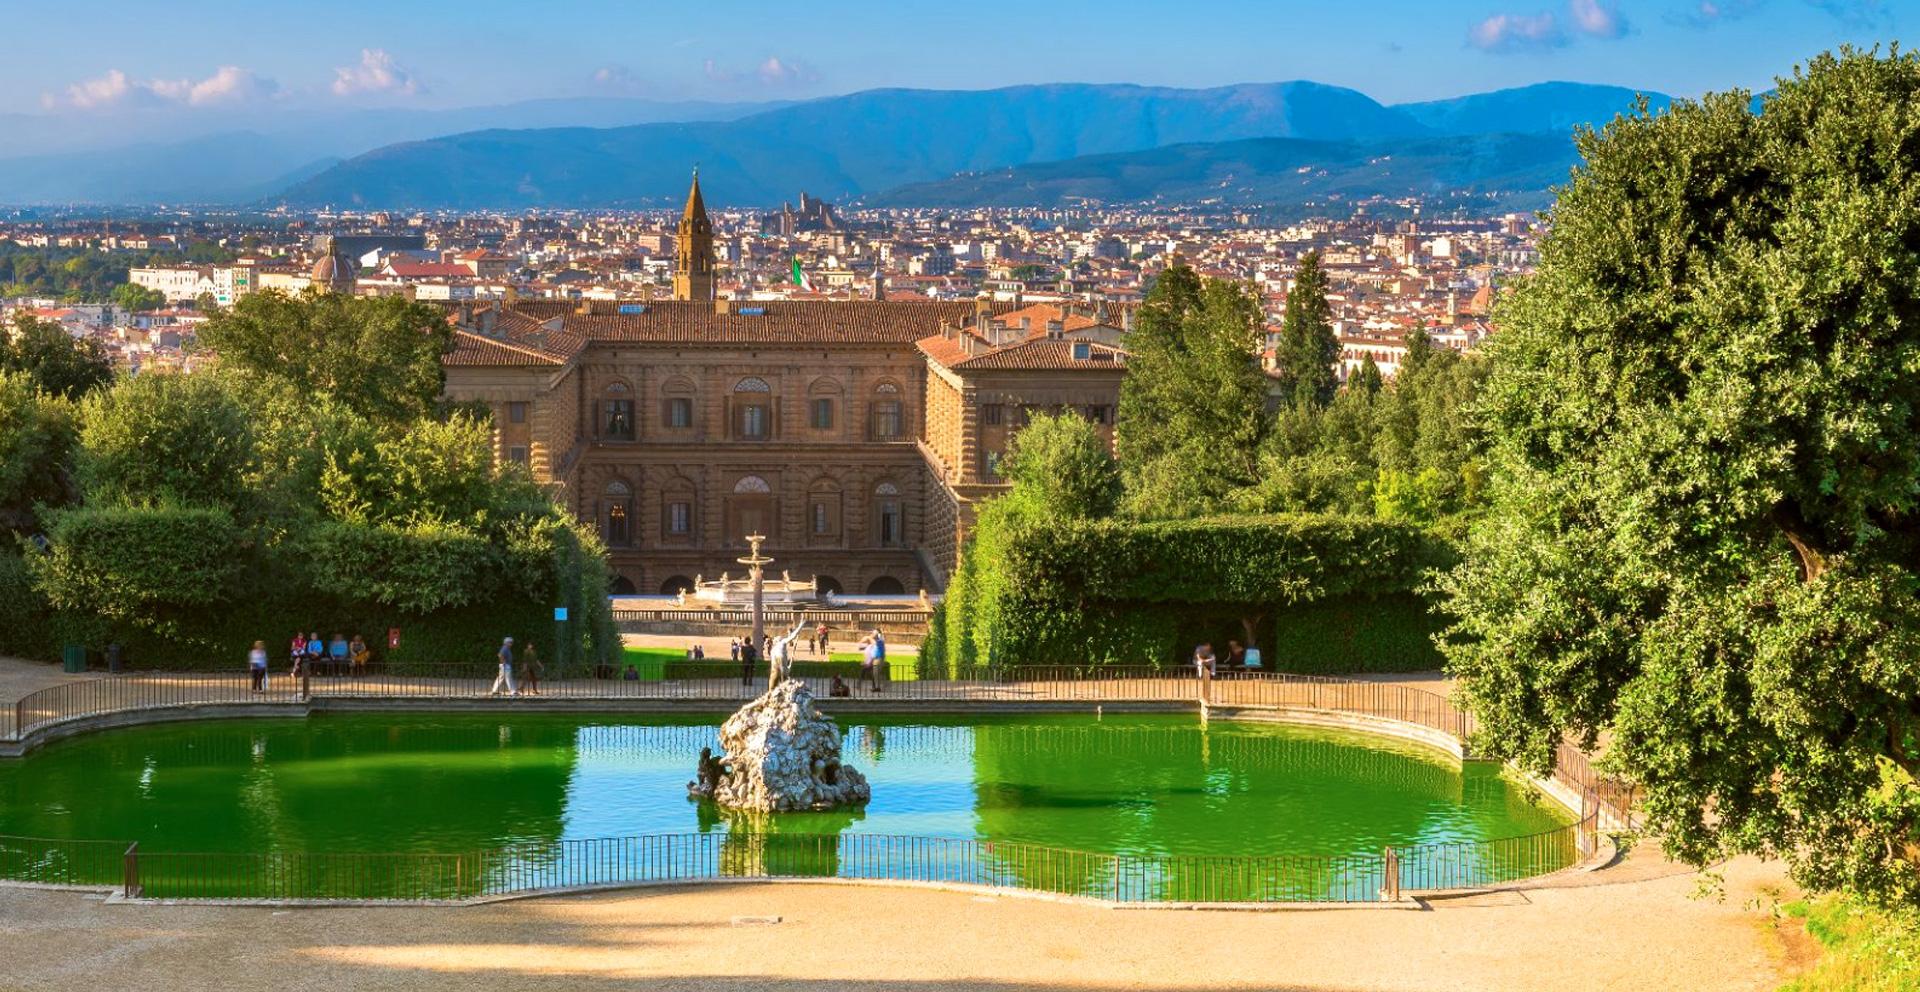 Drom Florence - Firenze Giardino di Boboli